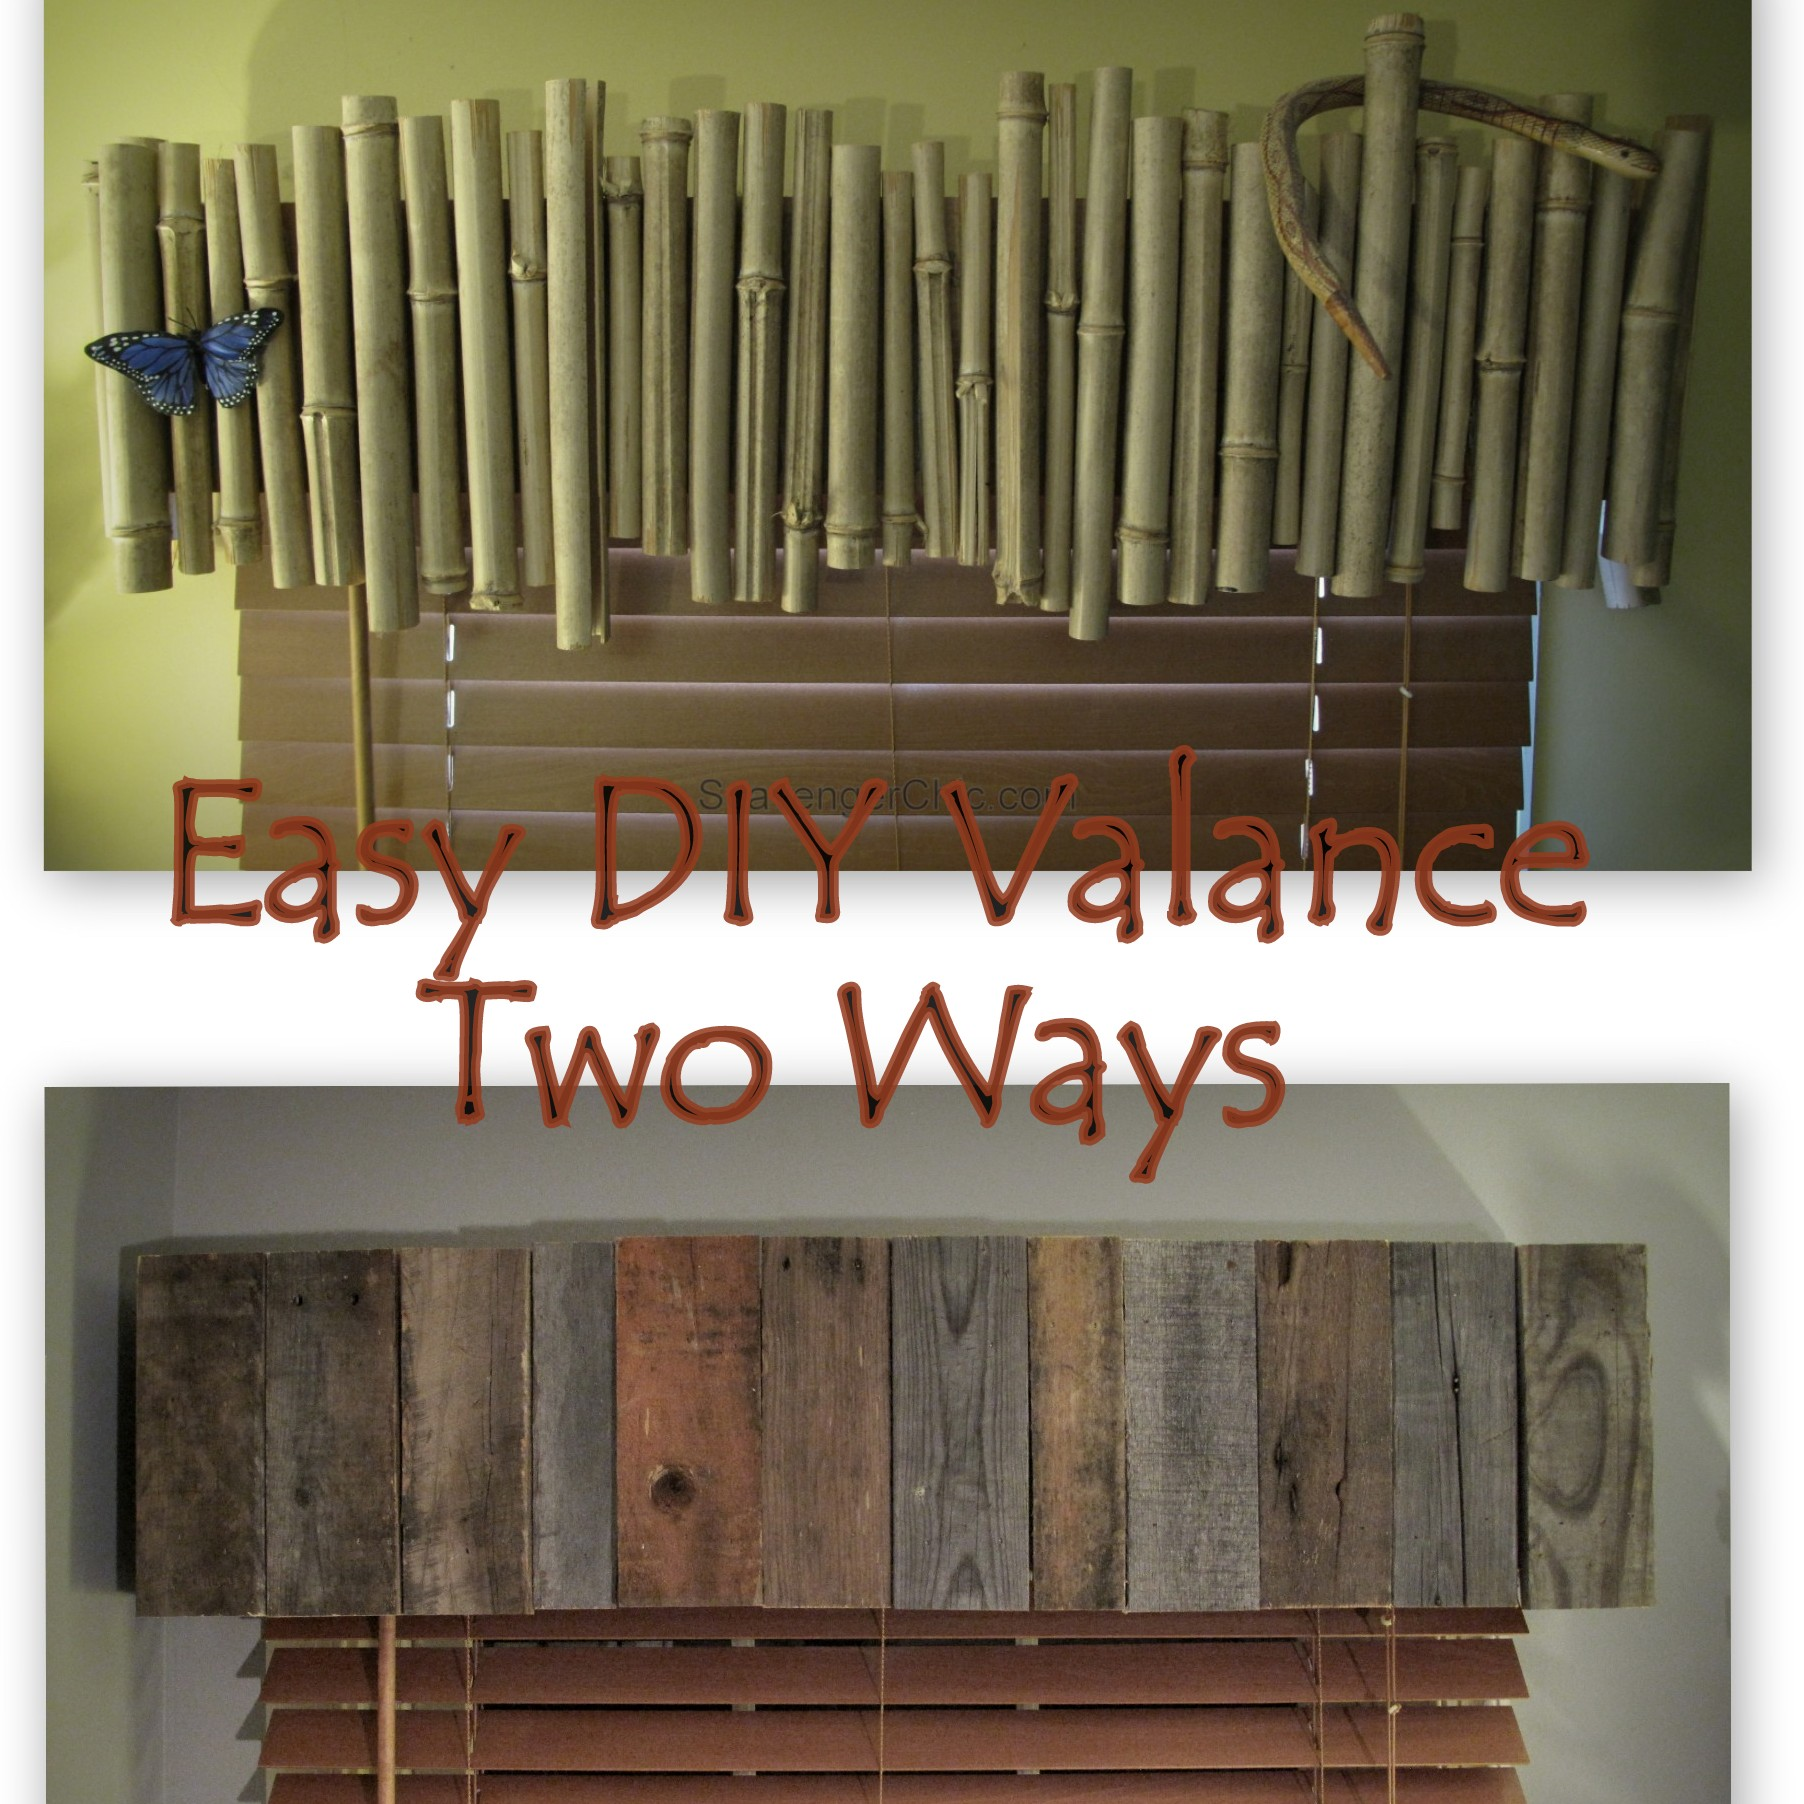 Diy Wood Valance Bamboo Or Pallet Wood Valance Easy Diy Scavenger Chic